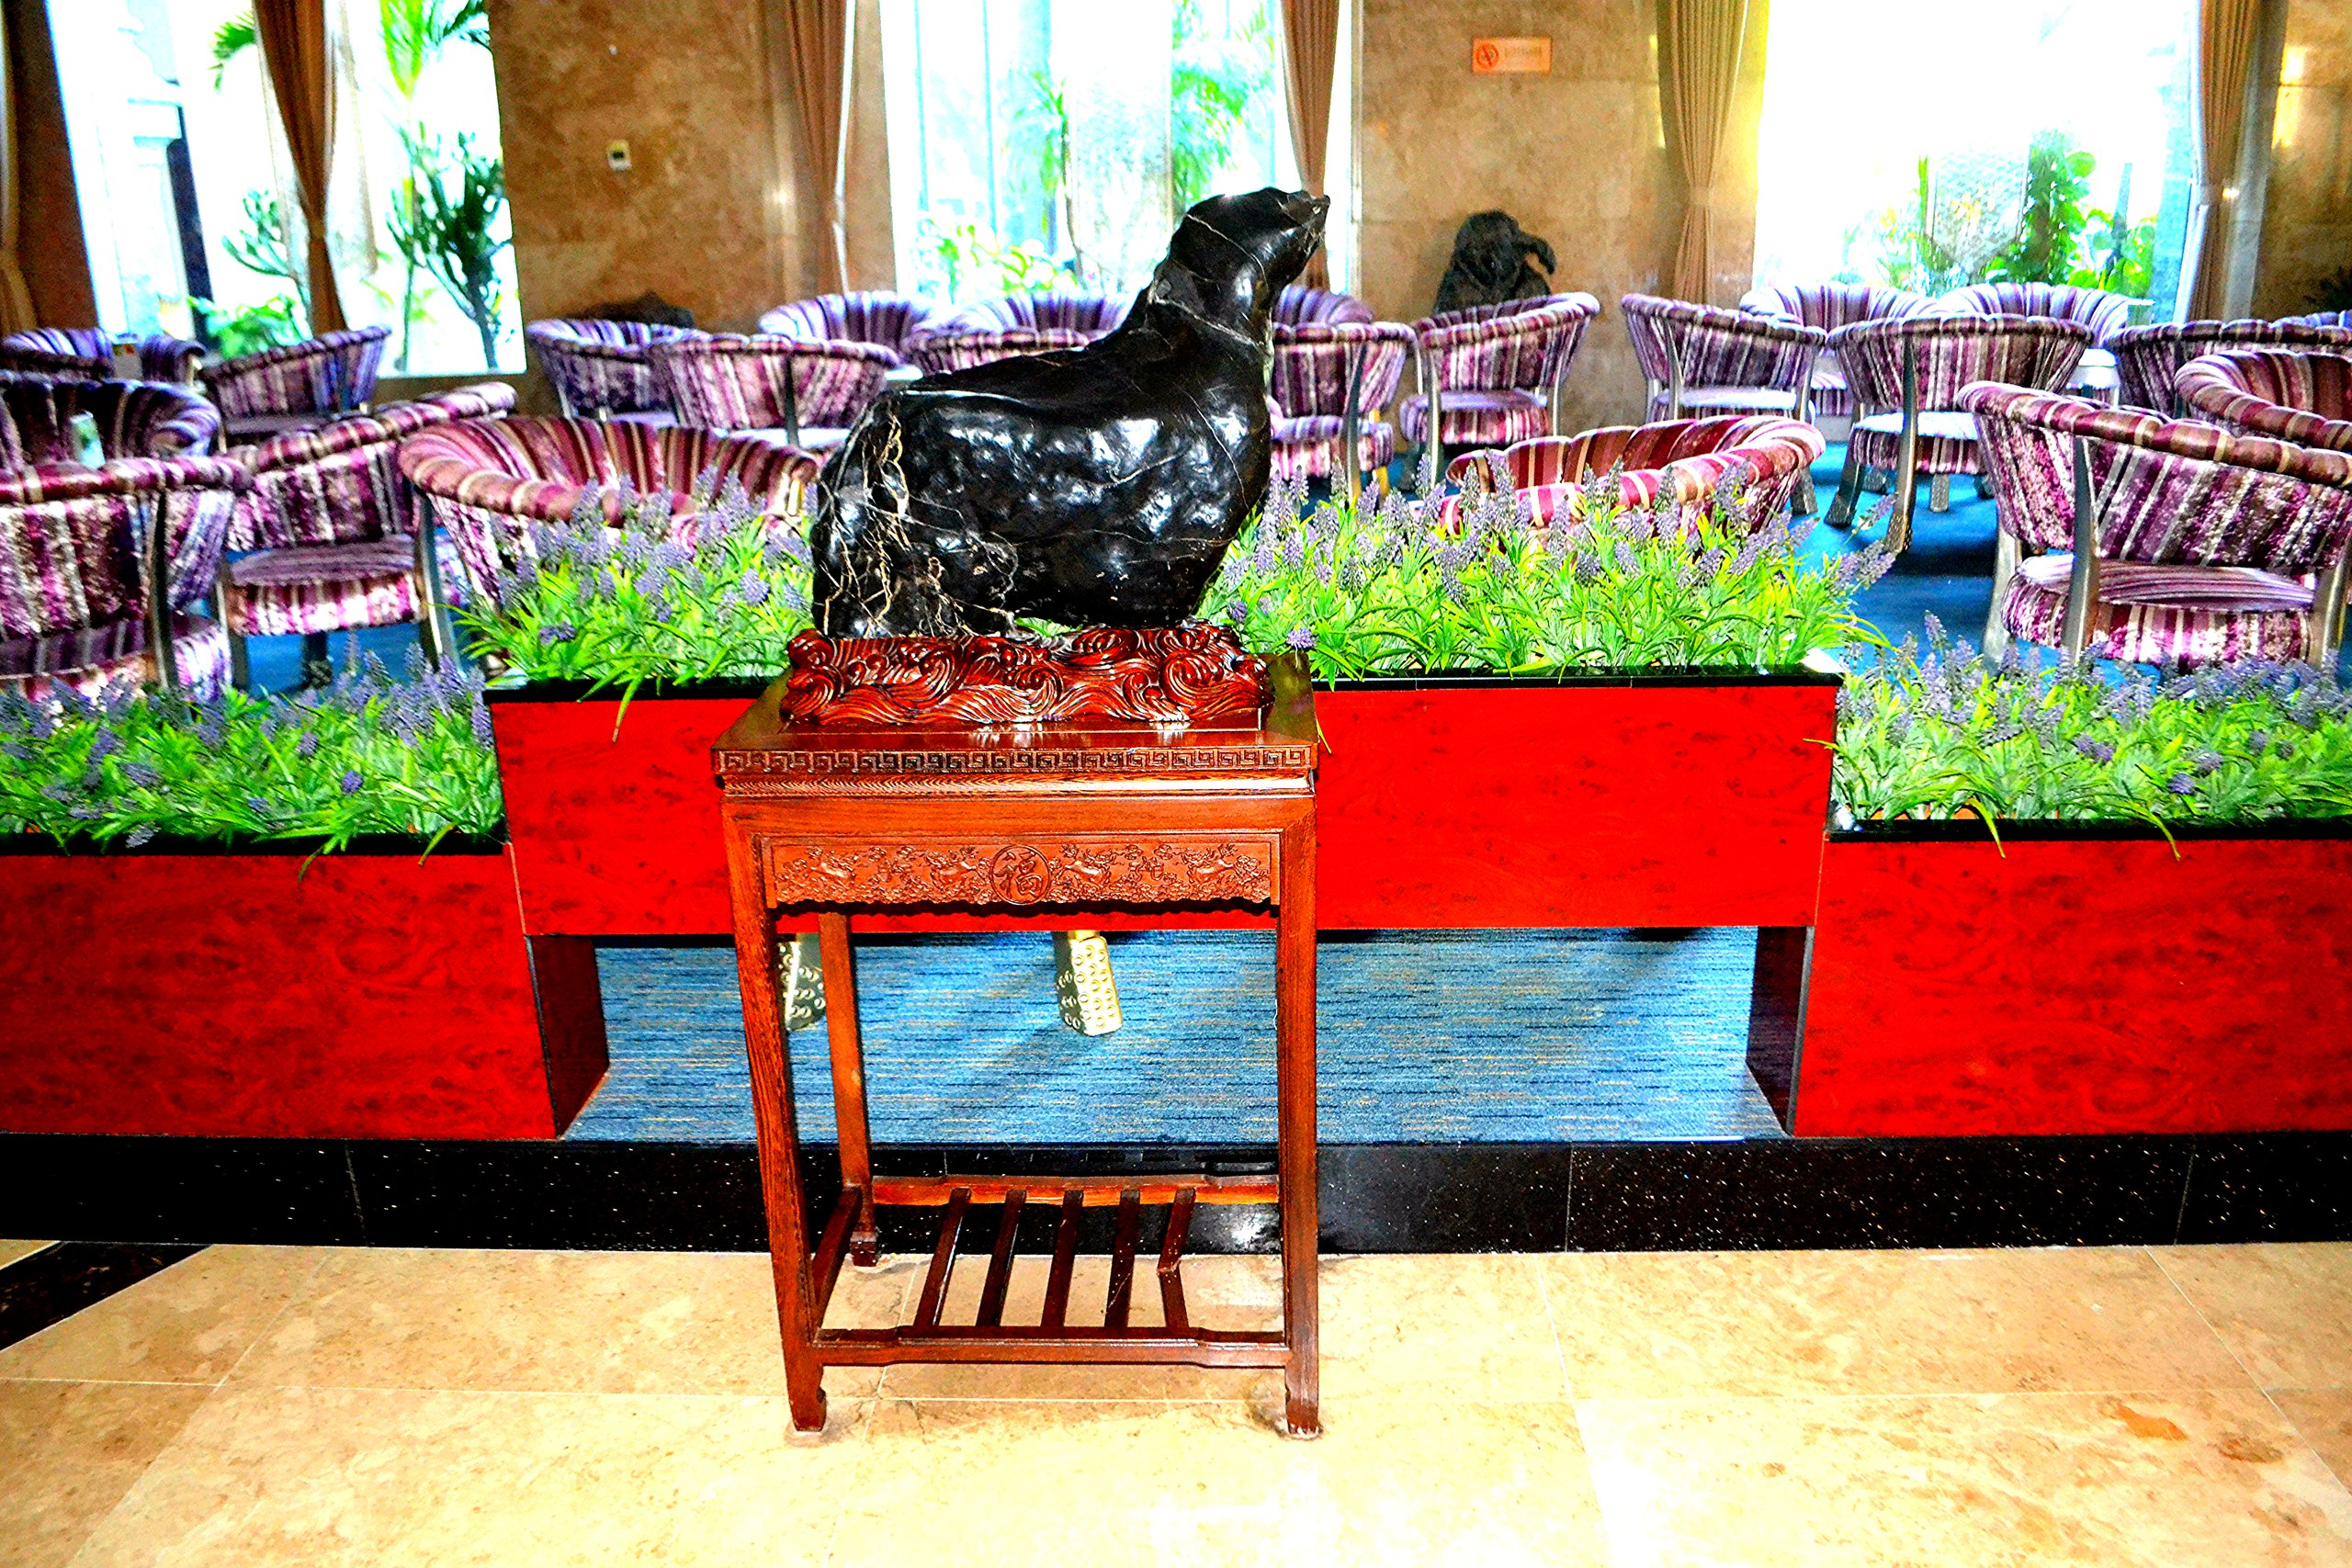 Елена Руденко (Валтея). Китай, о.Хайнань, г.Санья. (фото) NSd-qYFfHgw